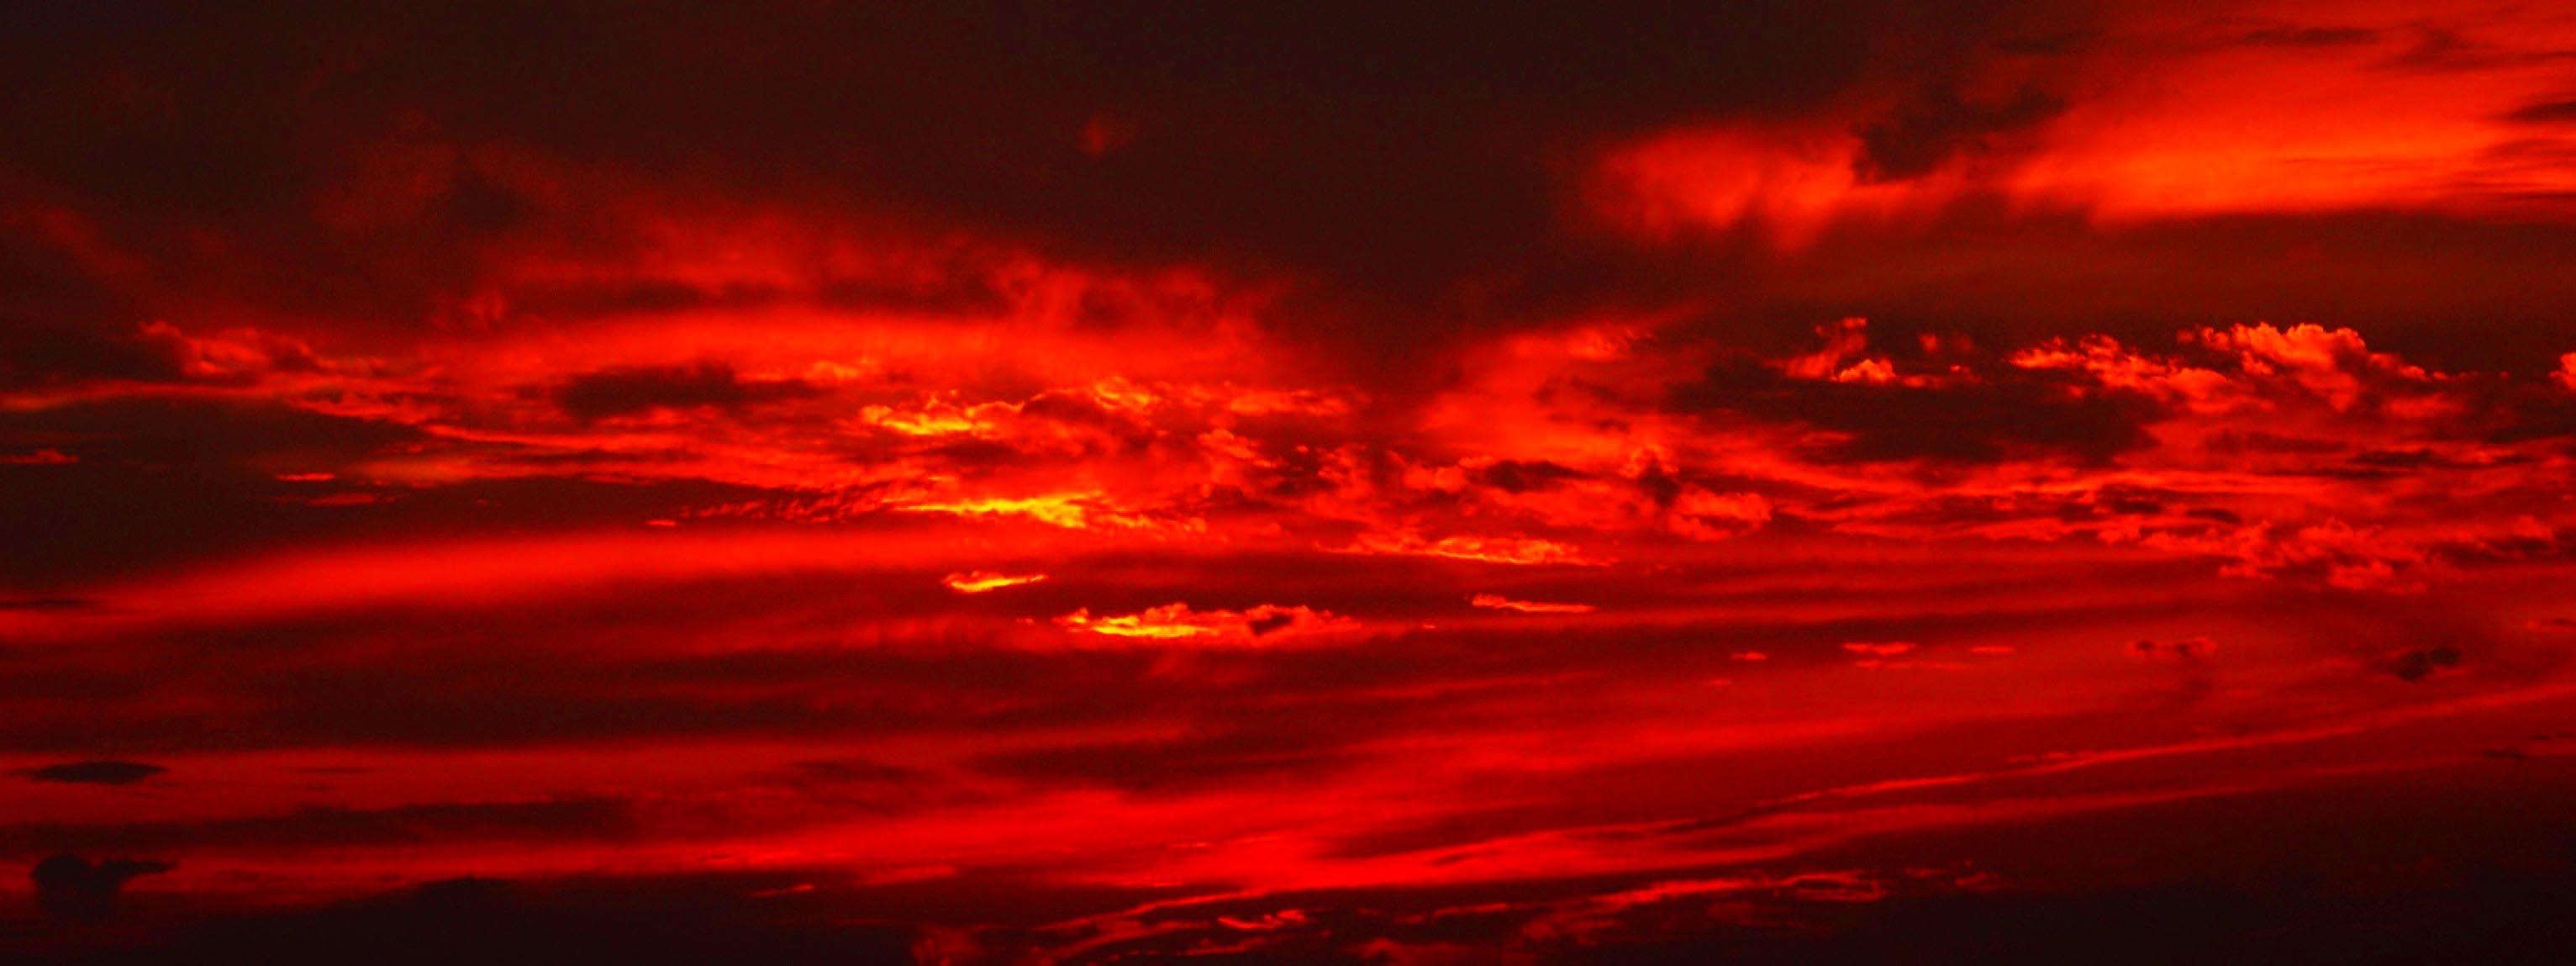 fire red sky tim